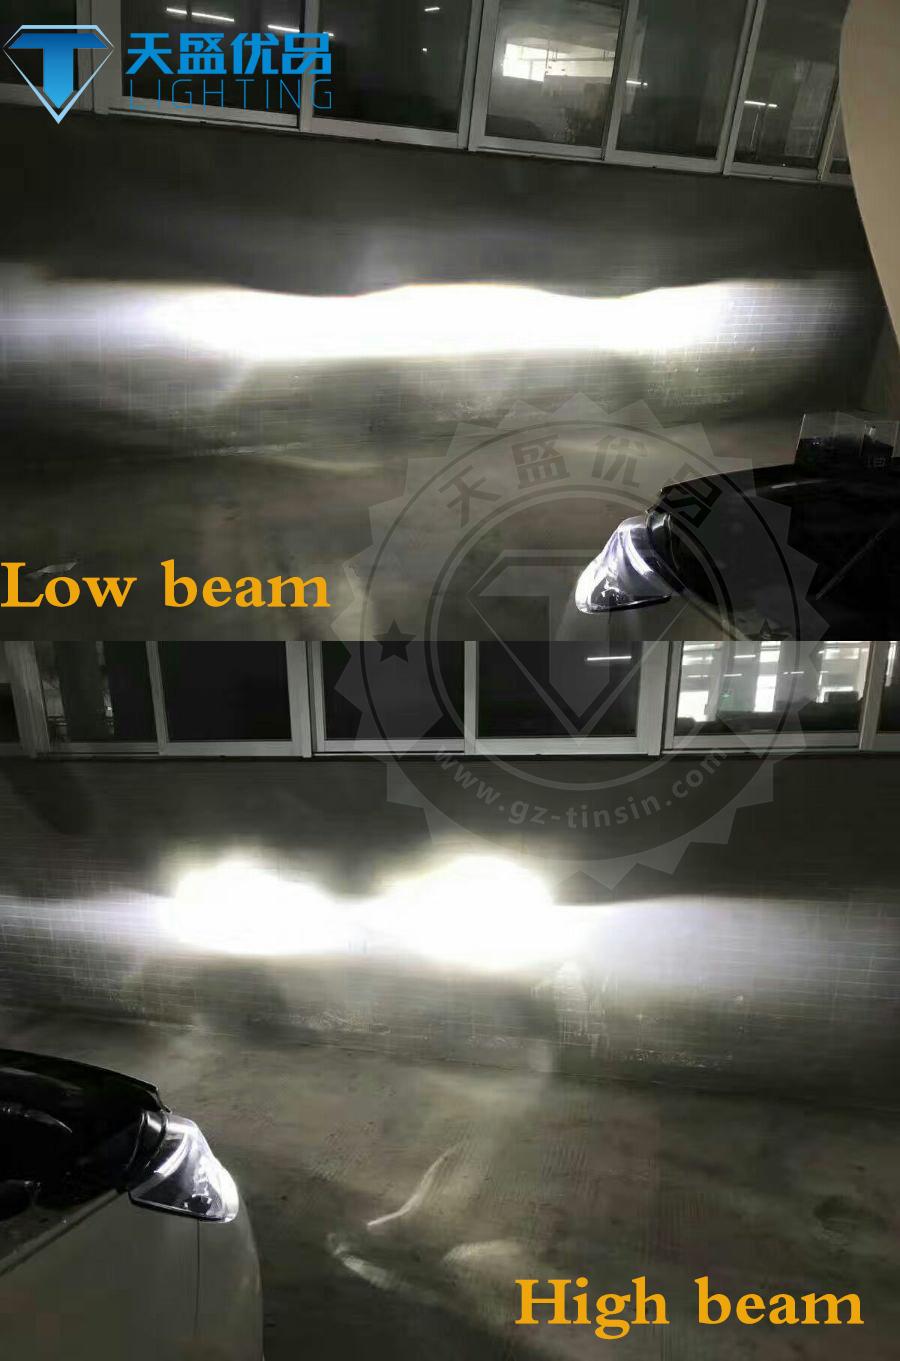 High power high lumen 60w 8400lm Turbine5 T5 led light auto parts led  headlight bulb h4 super bright h7 h11 led bulb for motors, View led h4